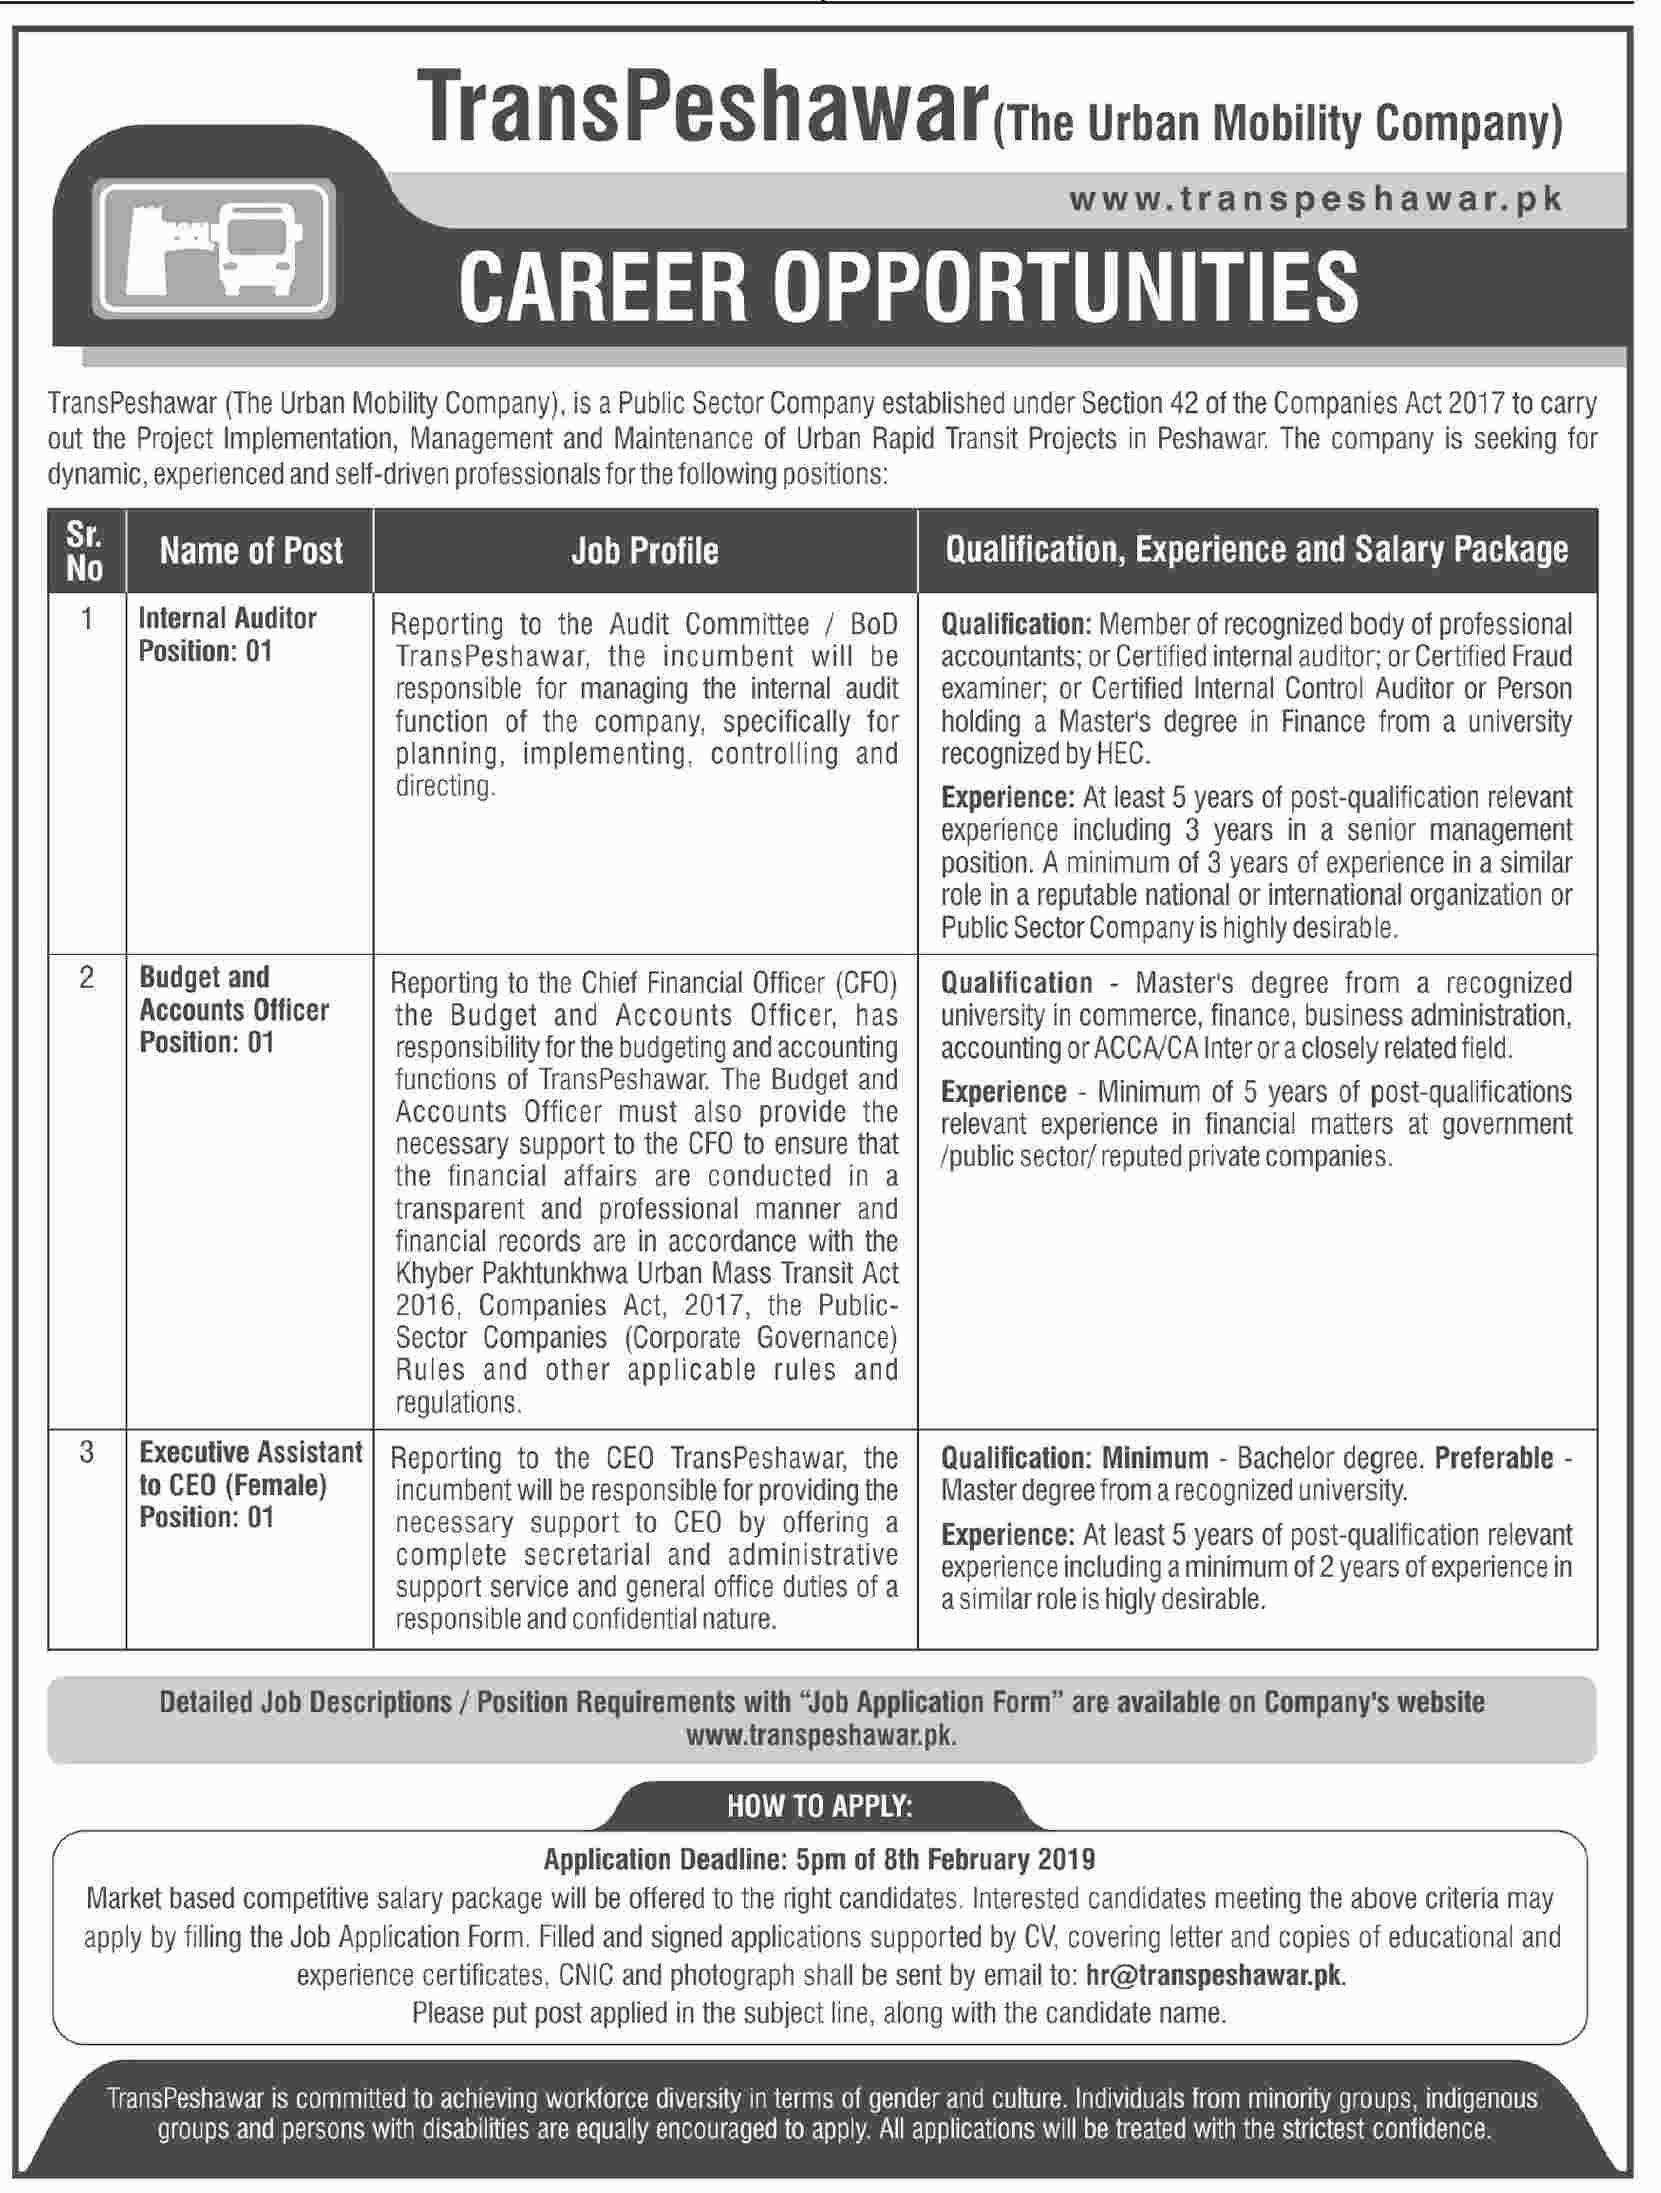 Trans Peshawar The Urban Mobility Company 24 Jan 2019 Jobs